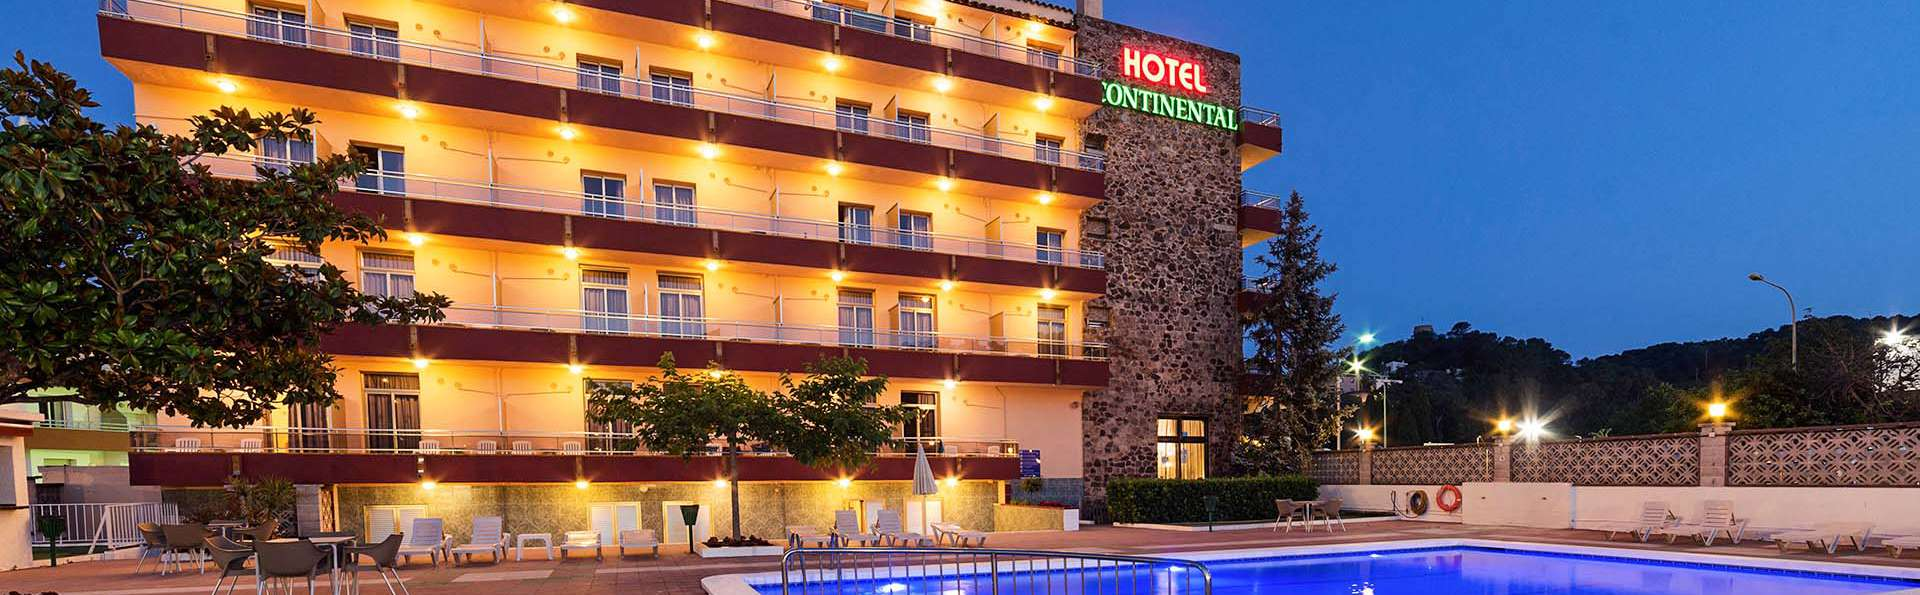 Hotel Continental Tossa - EDIT_EXTERIOR_03.jpg